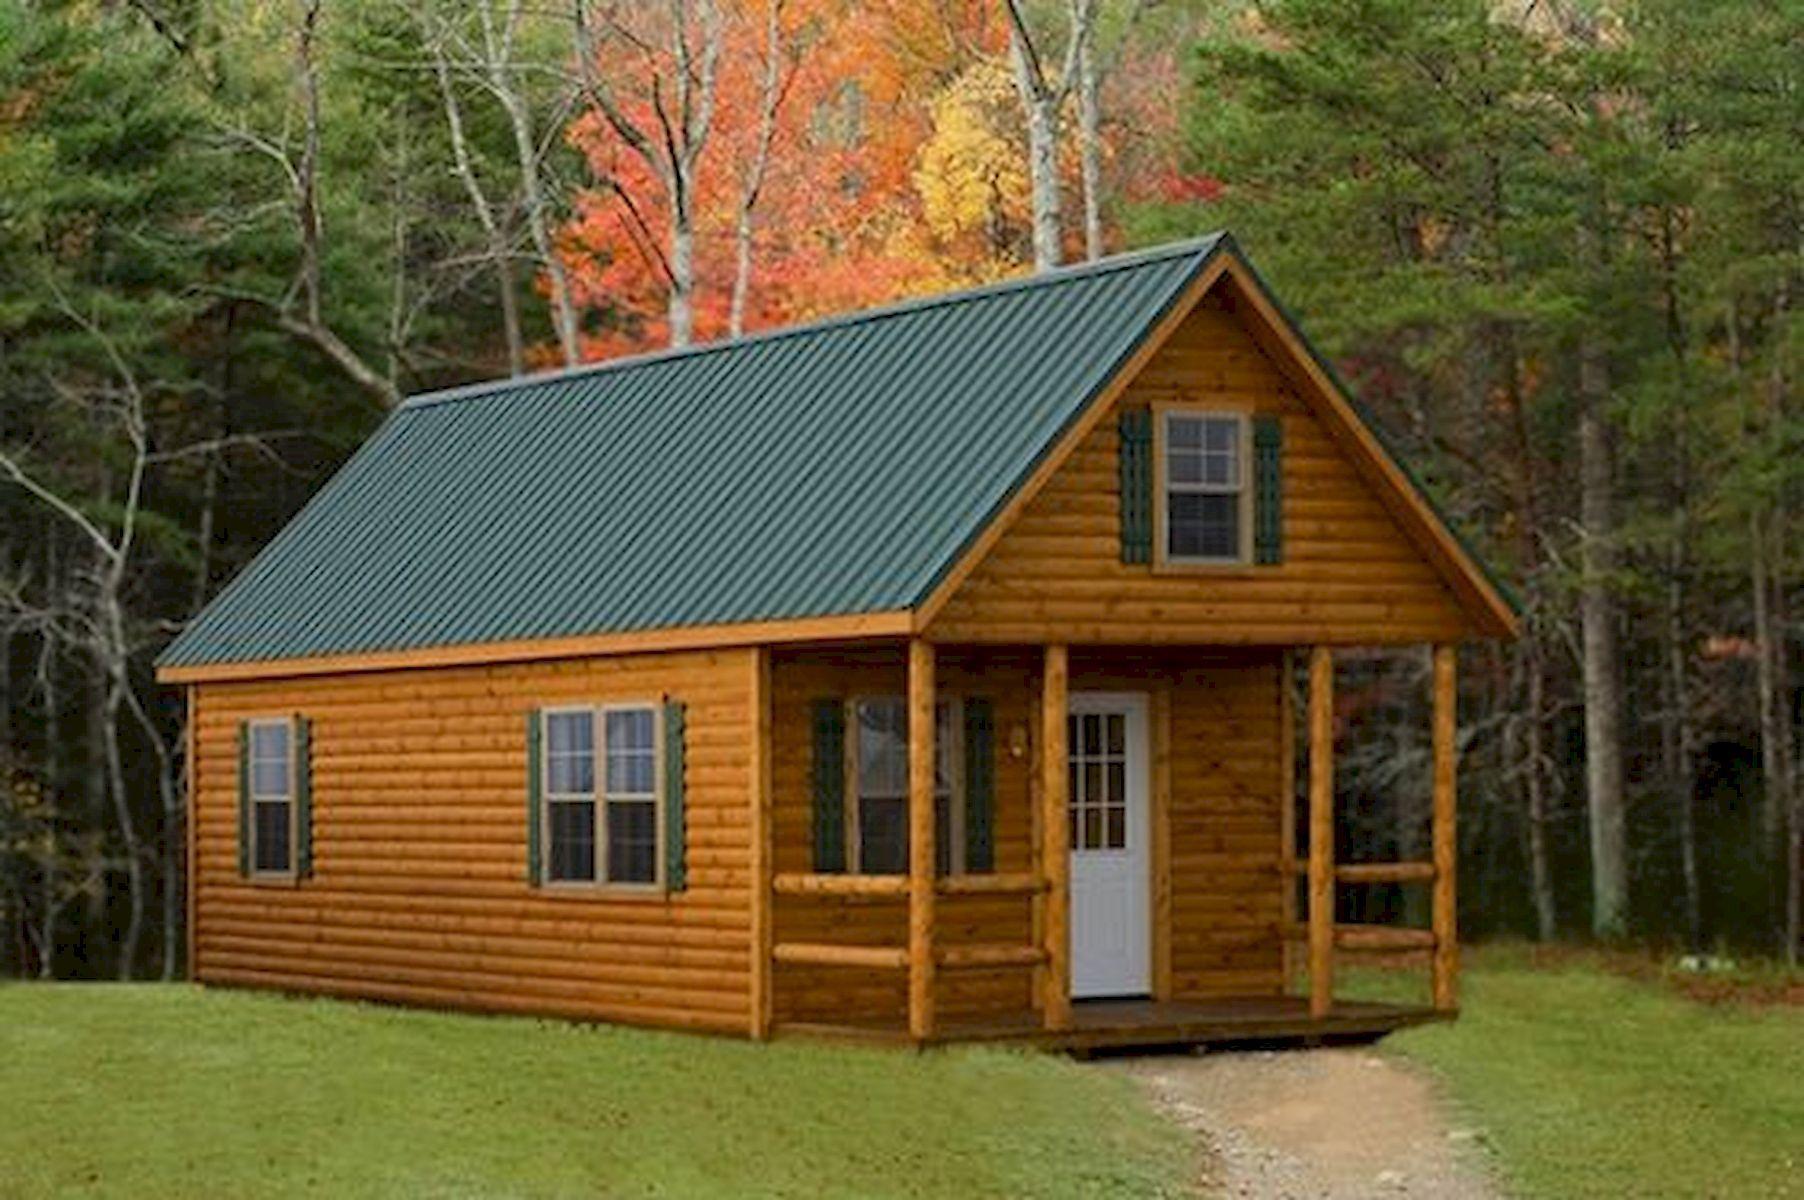 70 fantastic small log cabin homes design ideas exterior design rh pinterest com